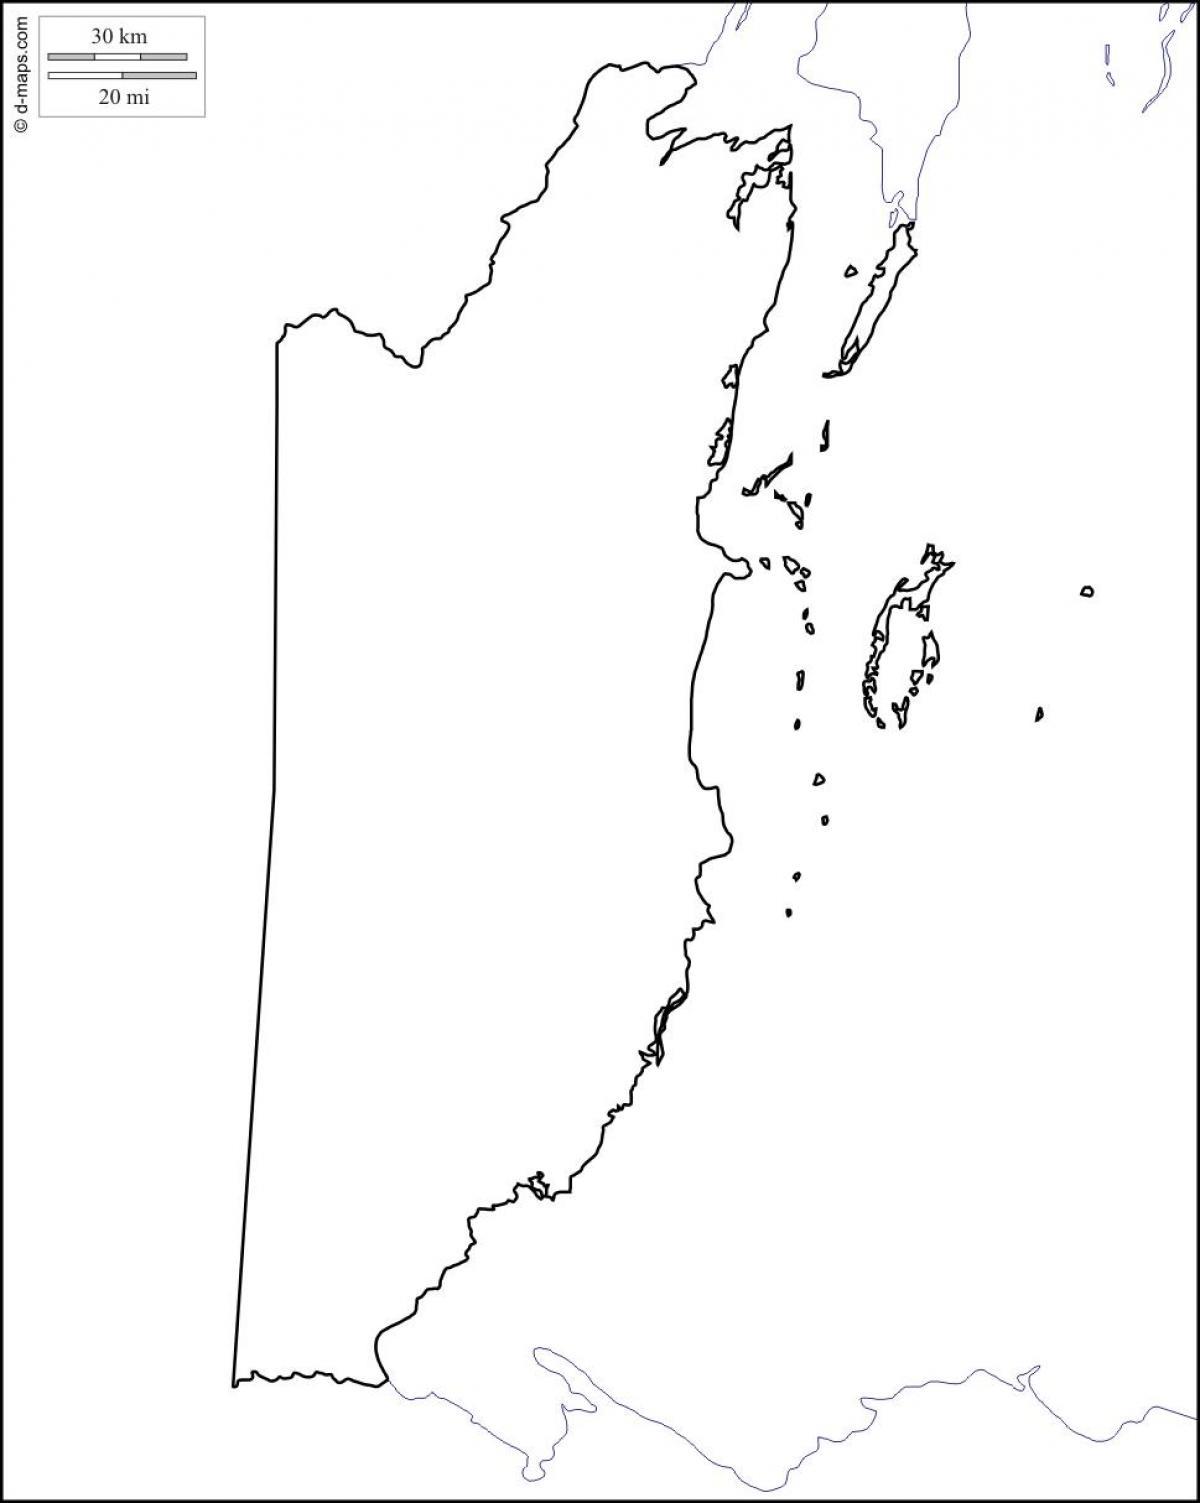 Leere Karte Von Belize Karte Leer Belize Mittelamerika